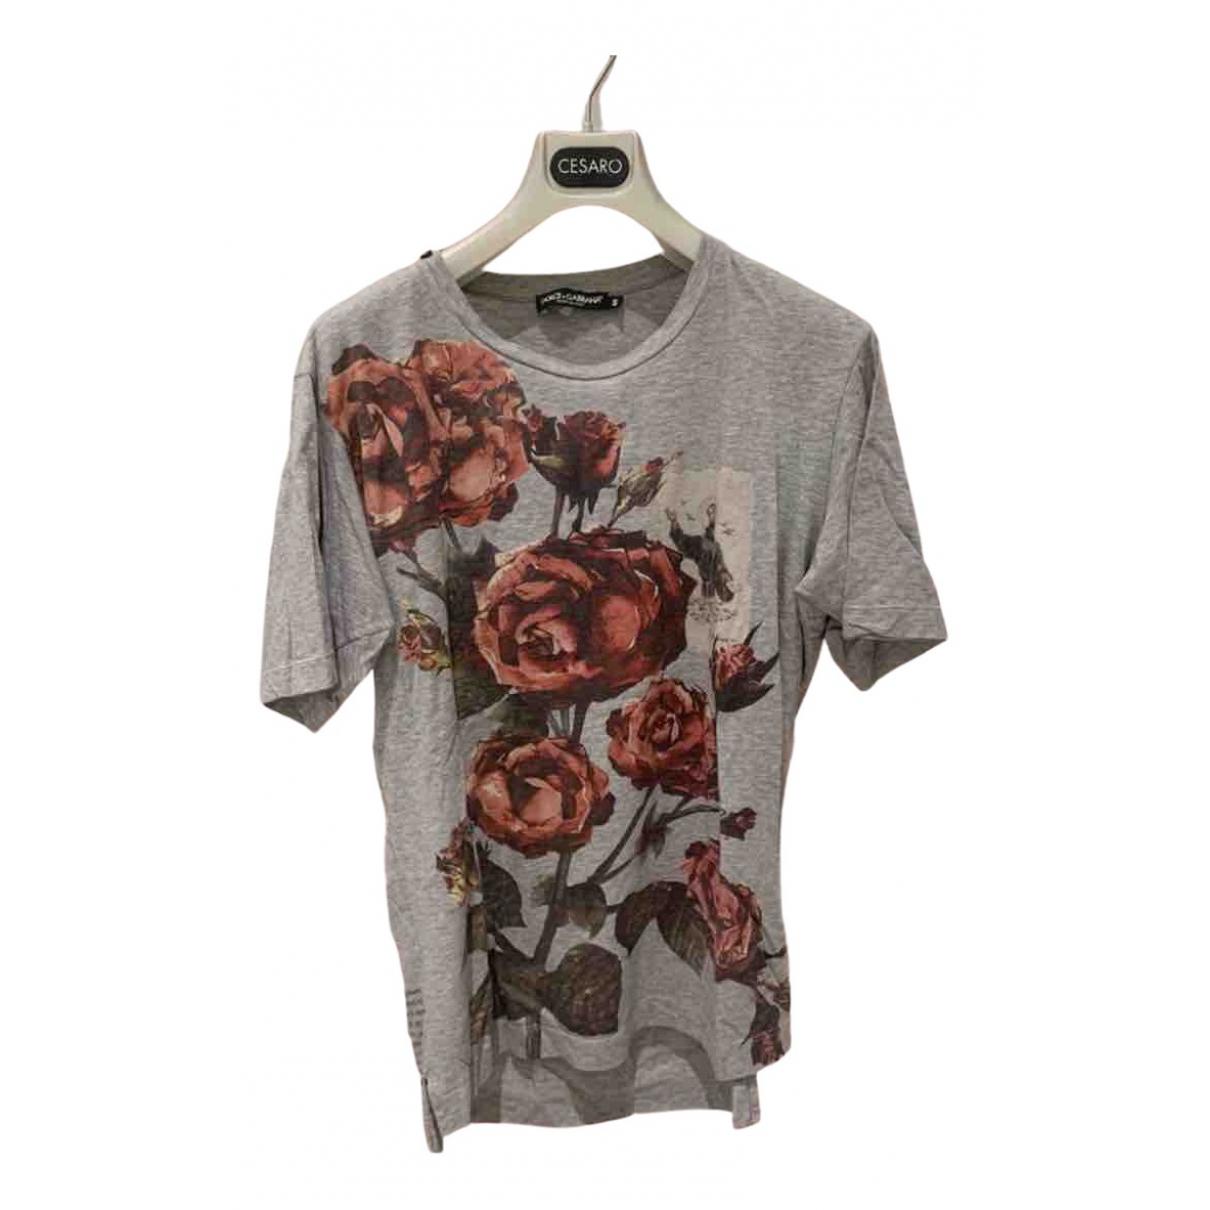 Dolce & Gabbana \N T-Shirts in  Grau Baumwolle